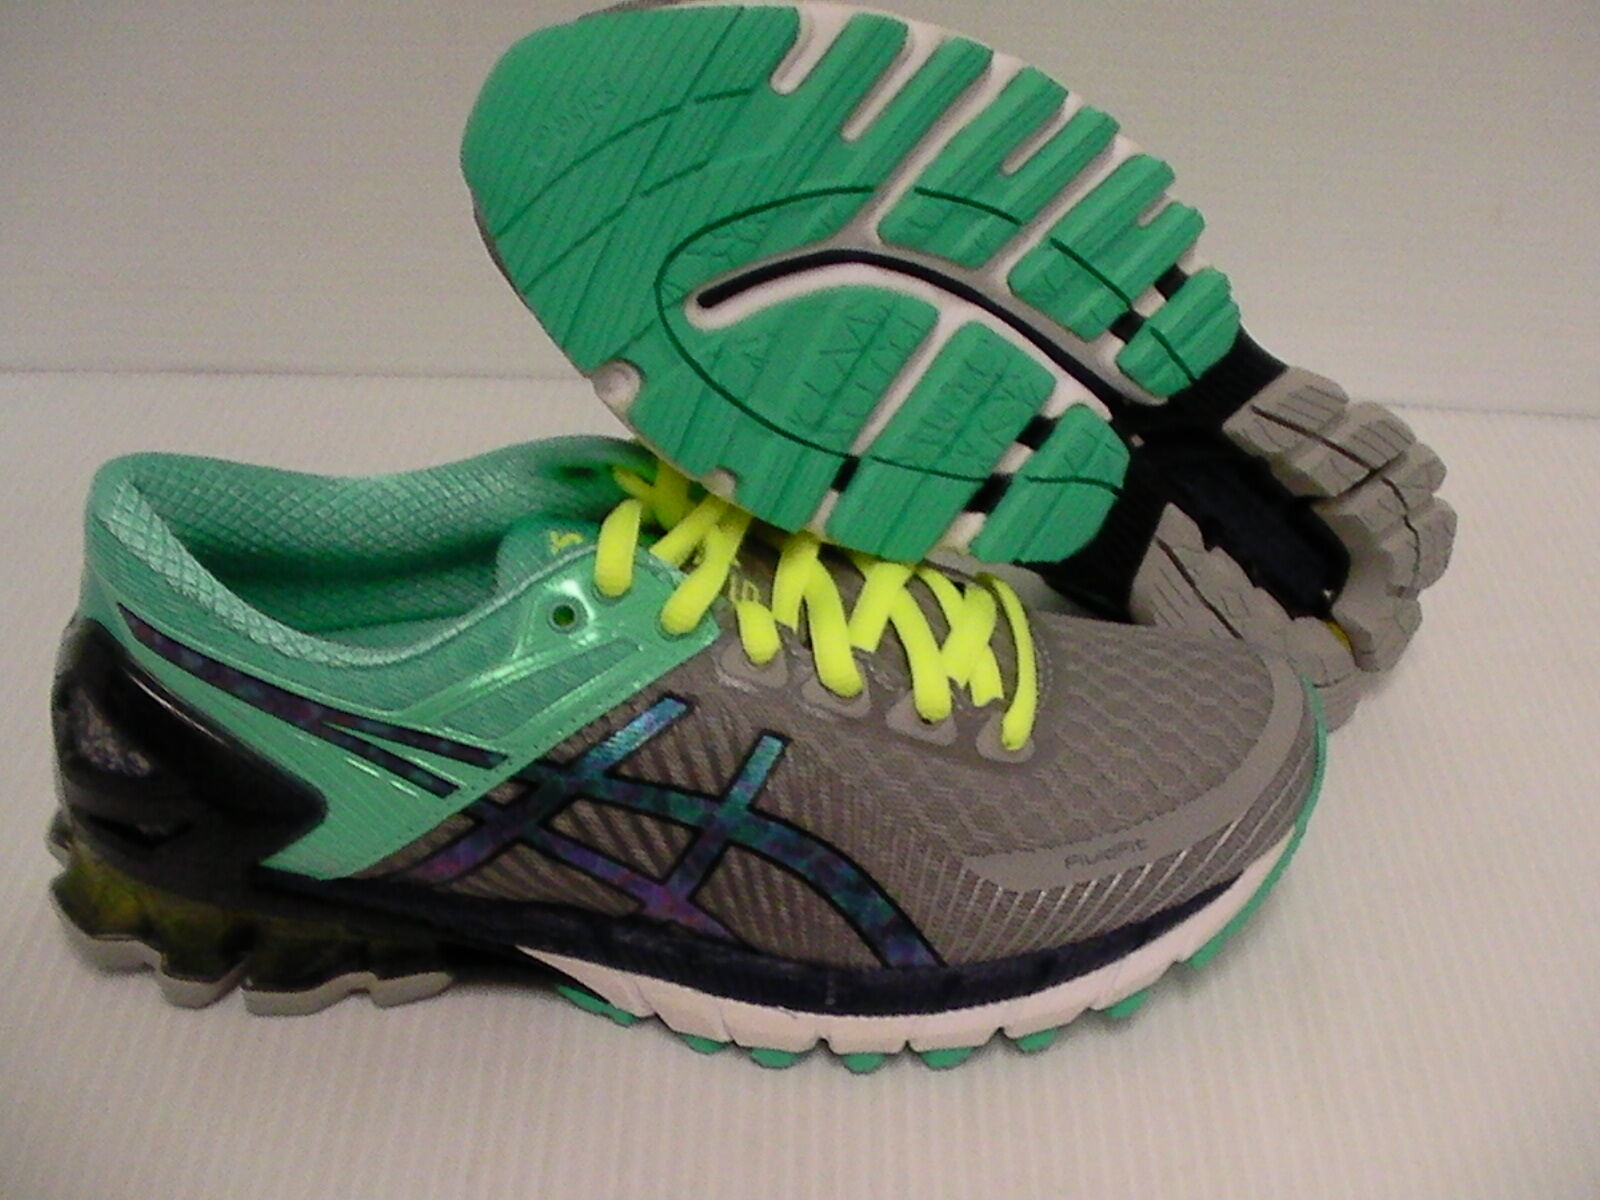 Asics women's running shoes gel kinsei 6 light grey titanium mint size 6.5 us